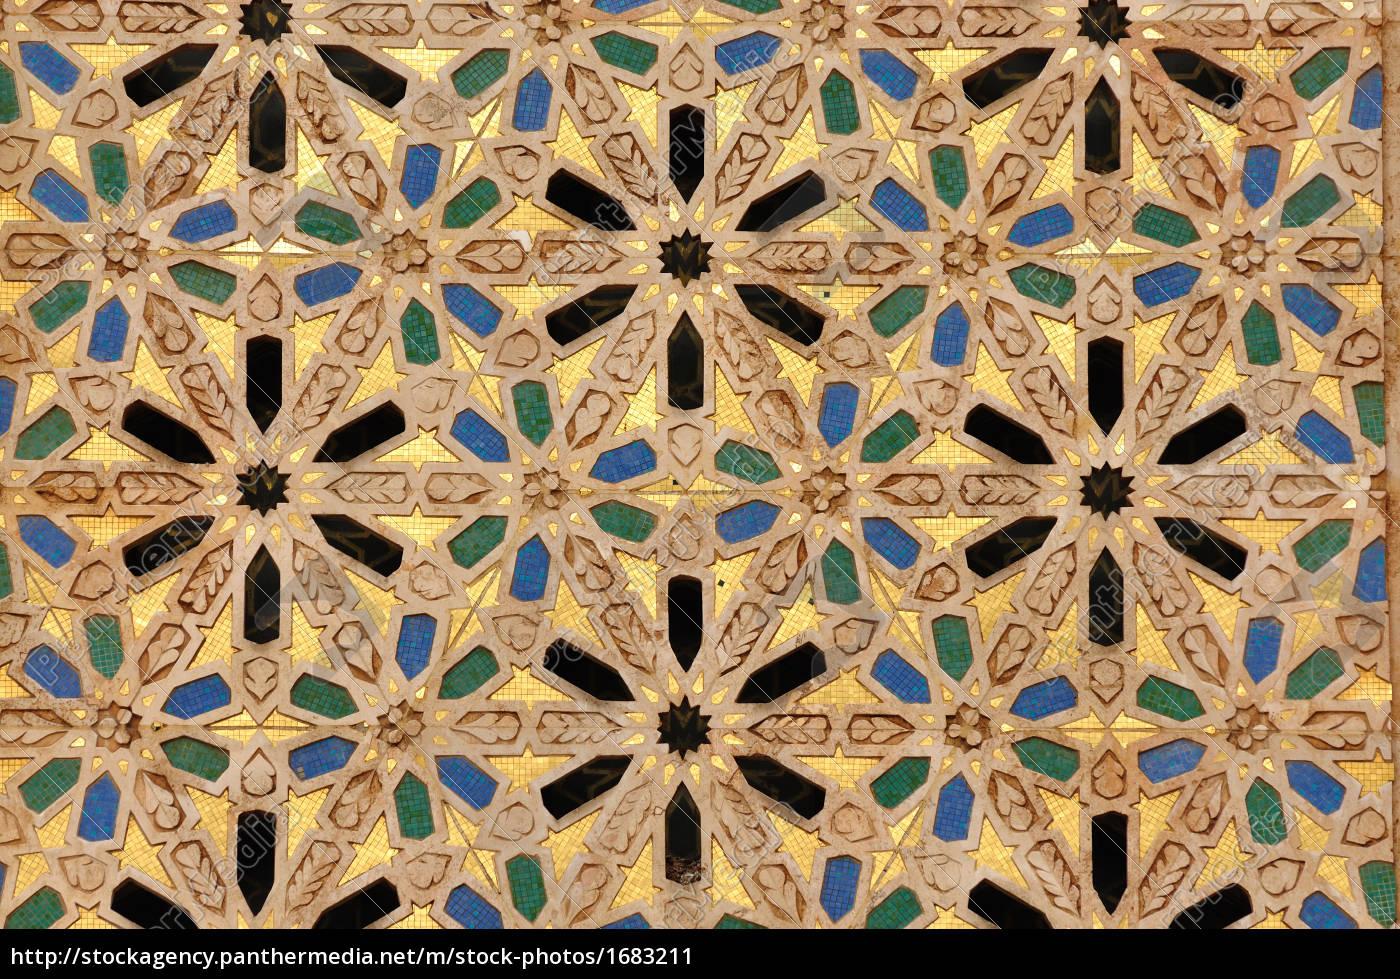 Orientalische mosaik ornamente   lizenzfreies bild   #1683211 ...